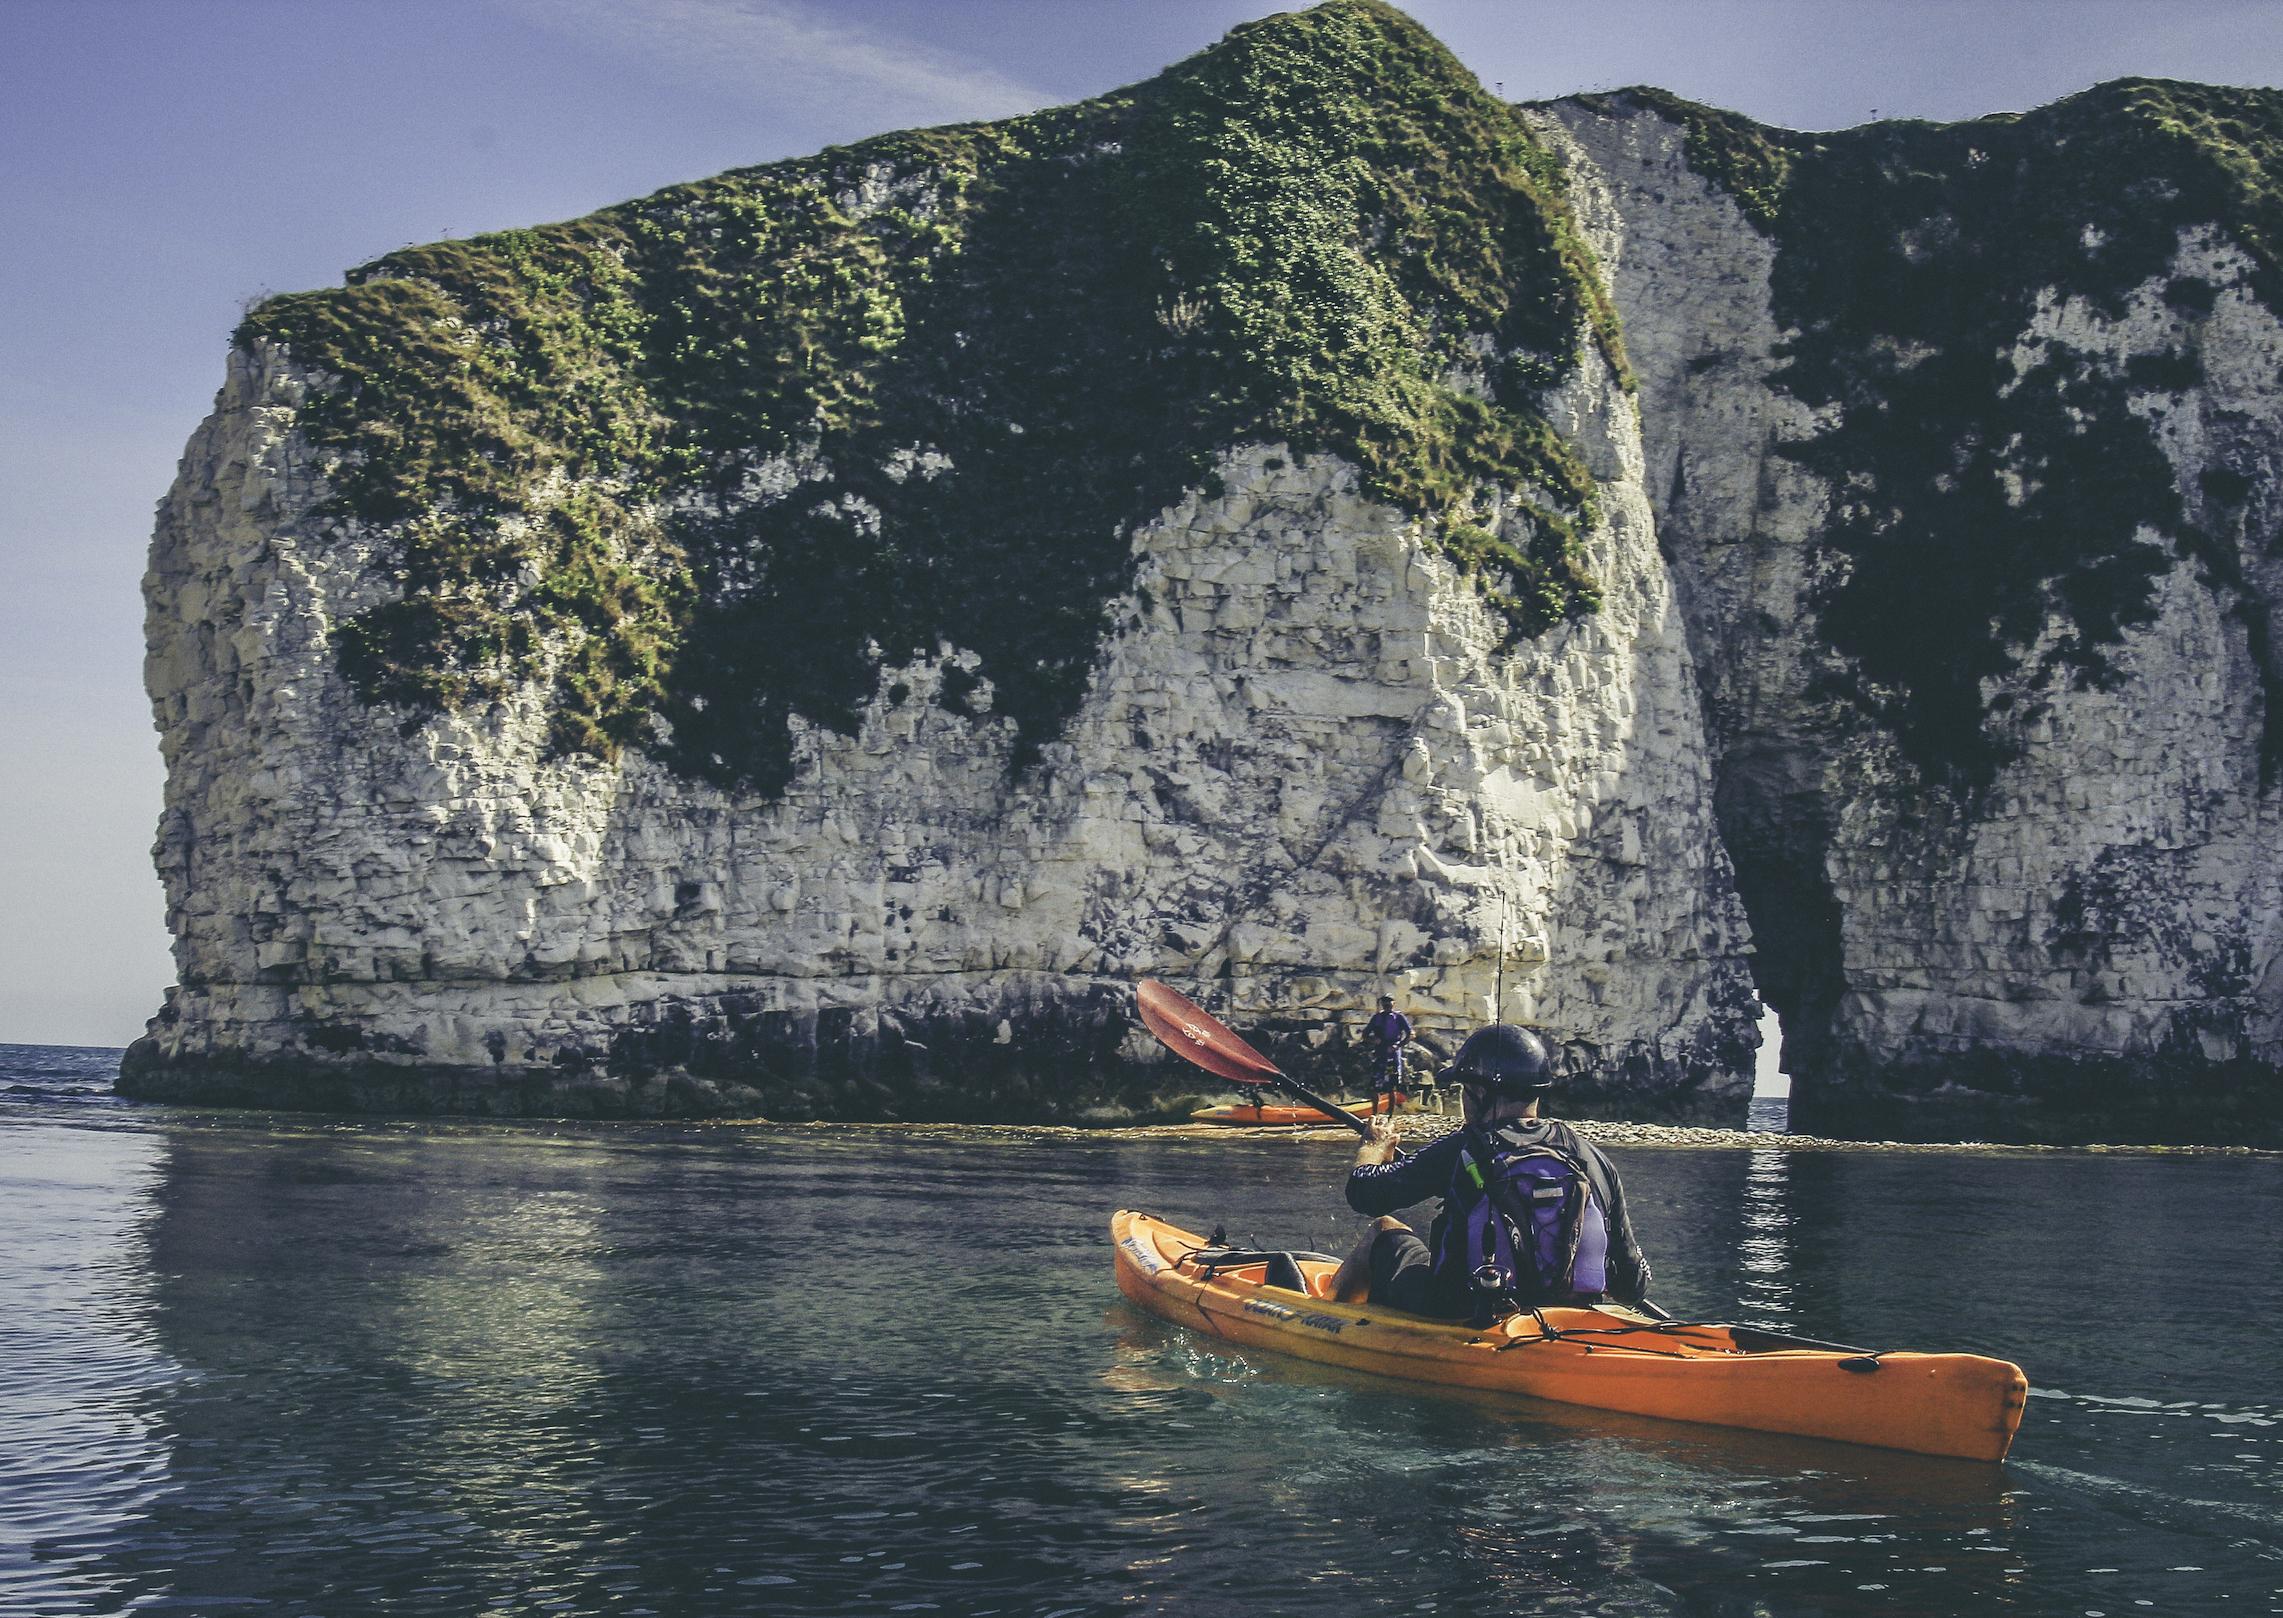 Dan Kayak Old Harry Rocks Landscape #2.jpg